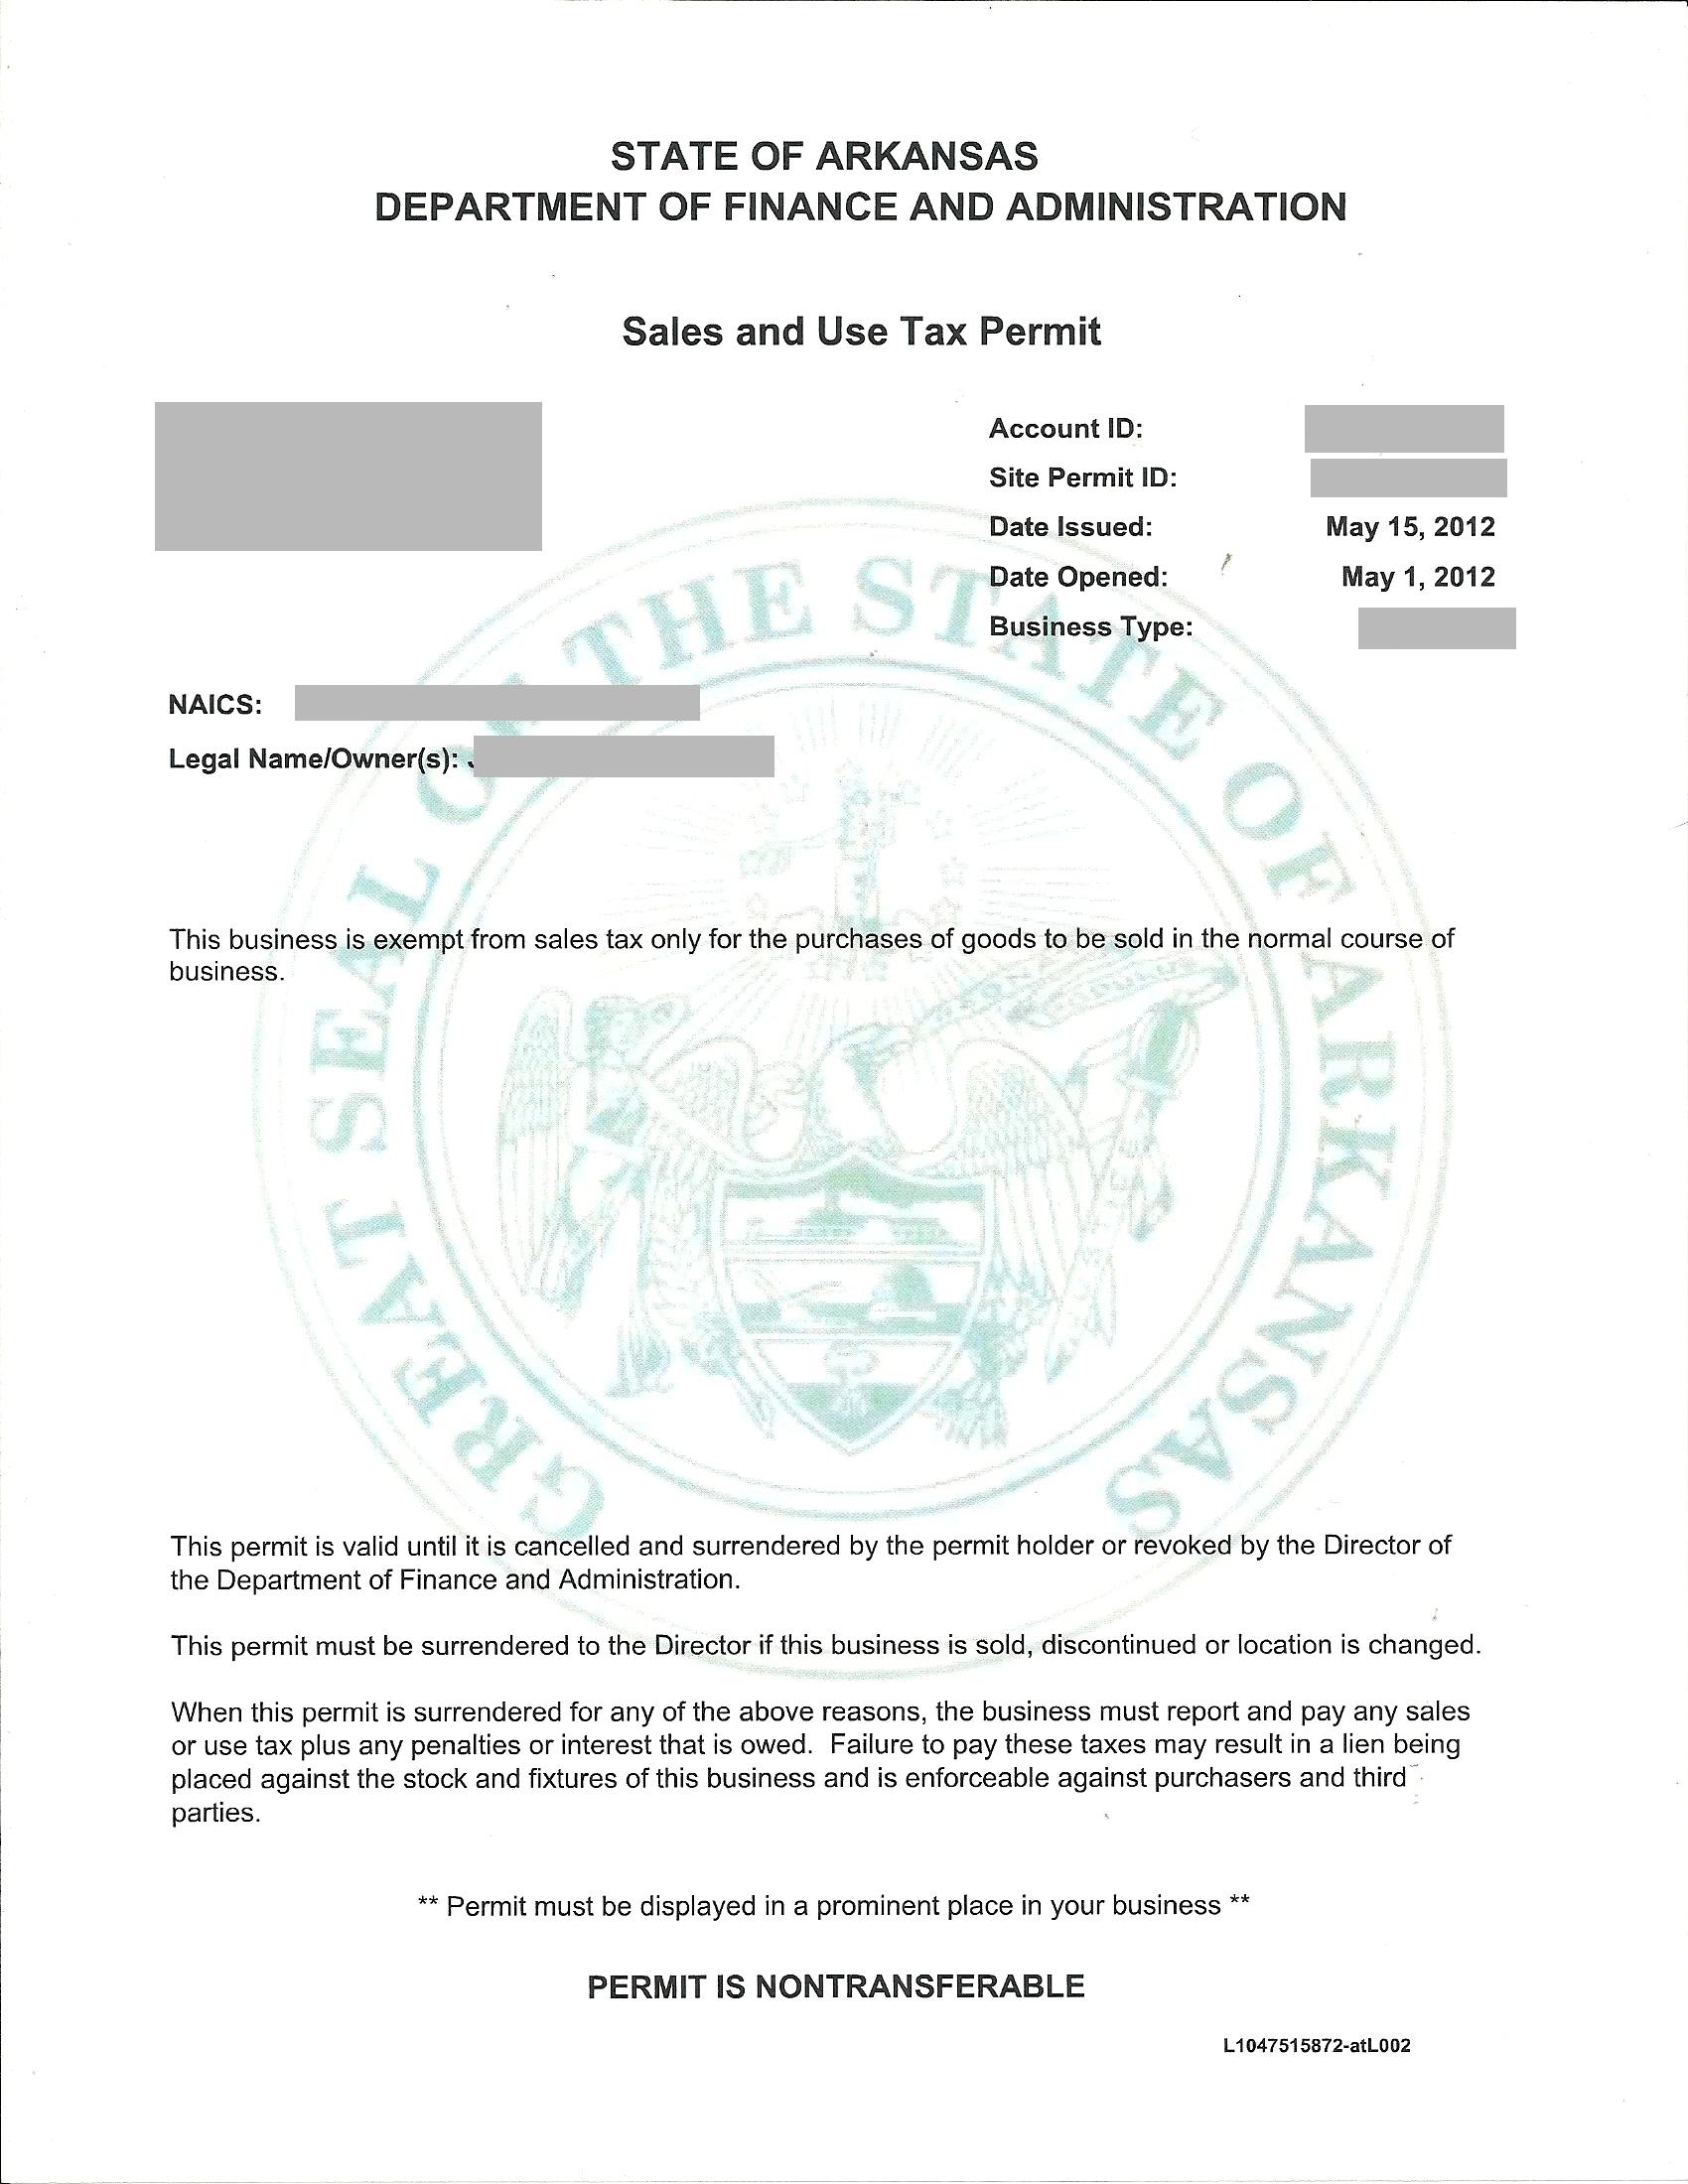 illinois sales tax exemption certificate bing images. Black Bedroom Furniture Sets. Home Design Ideas